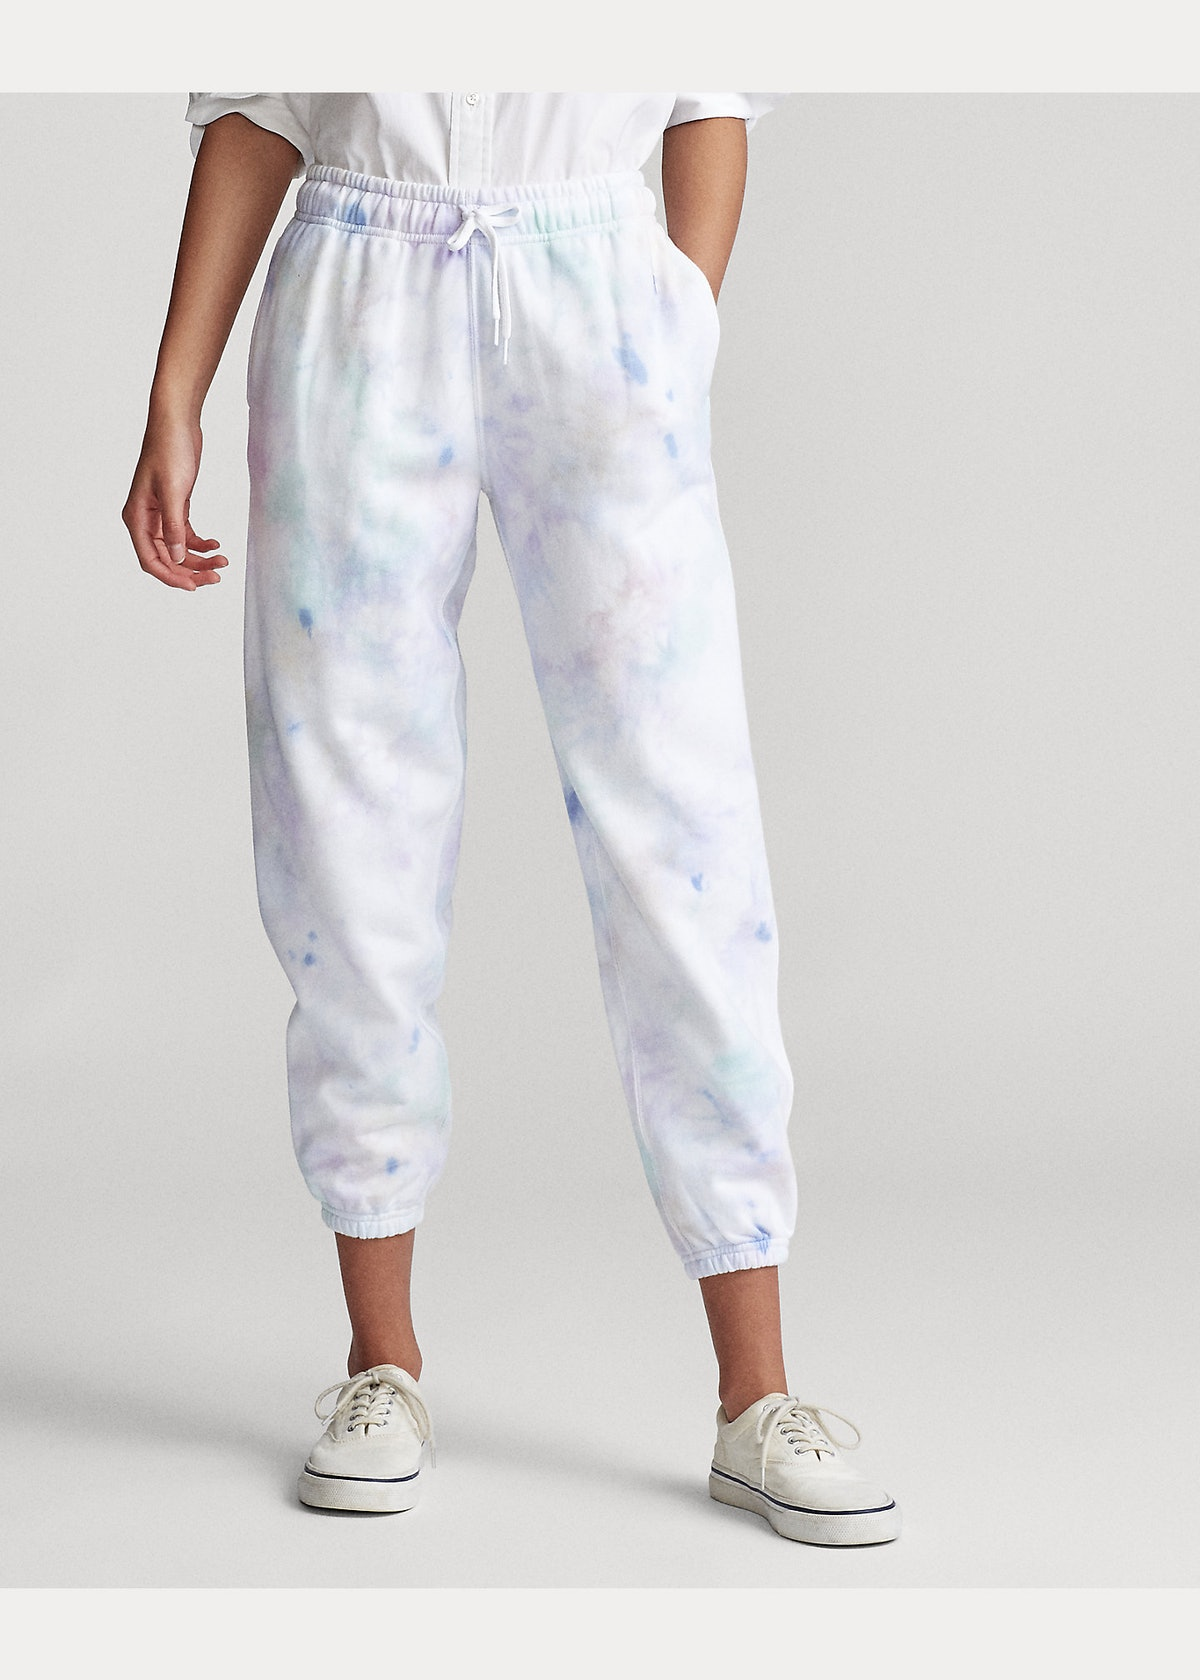 Polo Ralph Lauren Tie-Dye Fleece Sweatpant